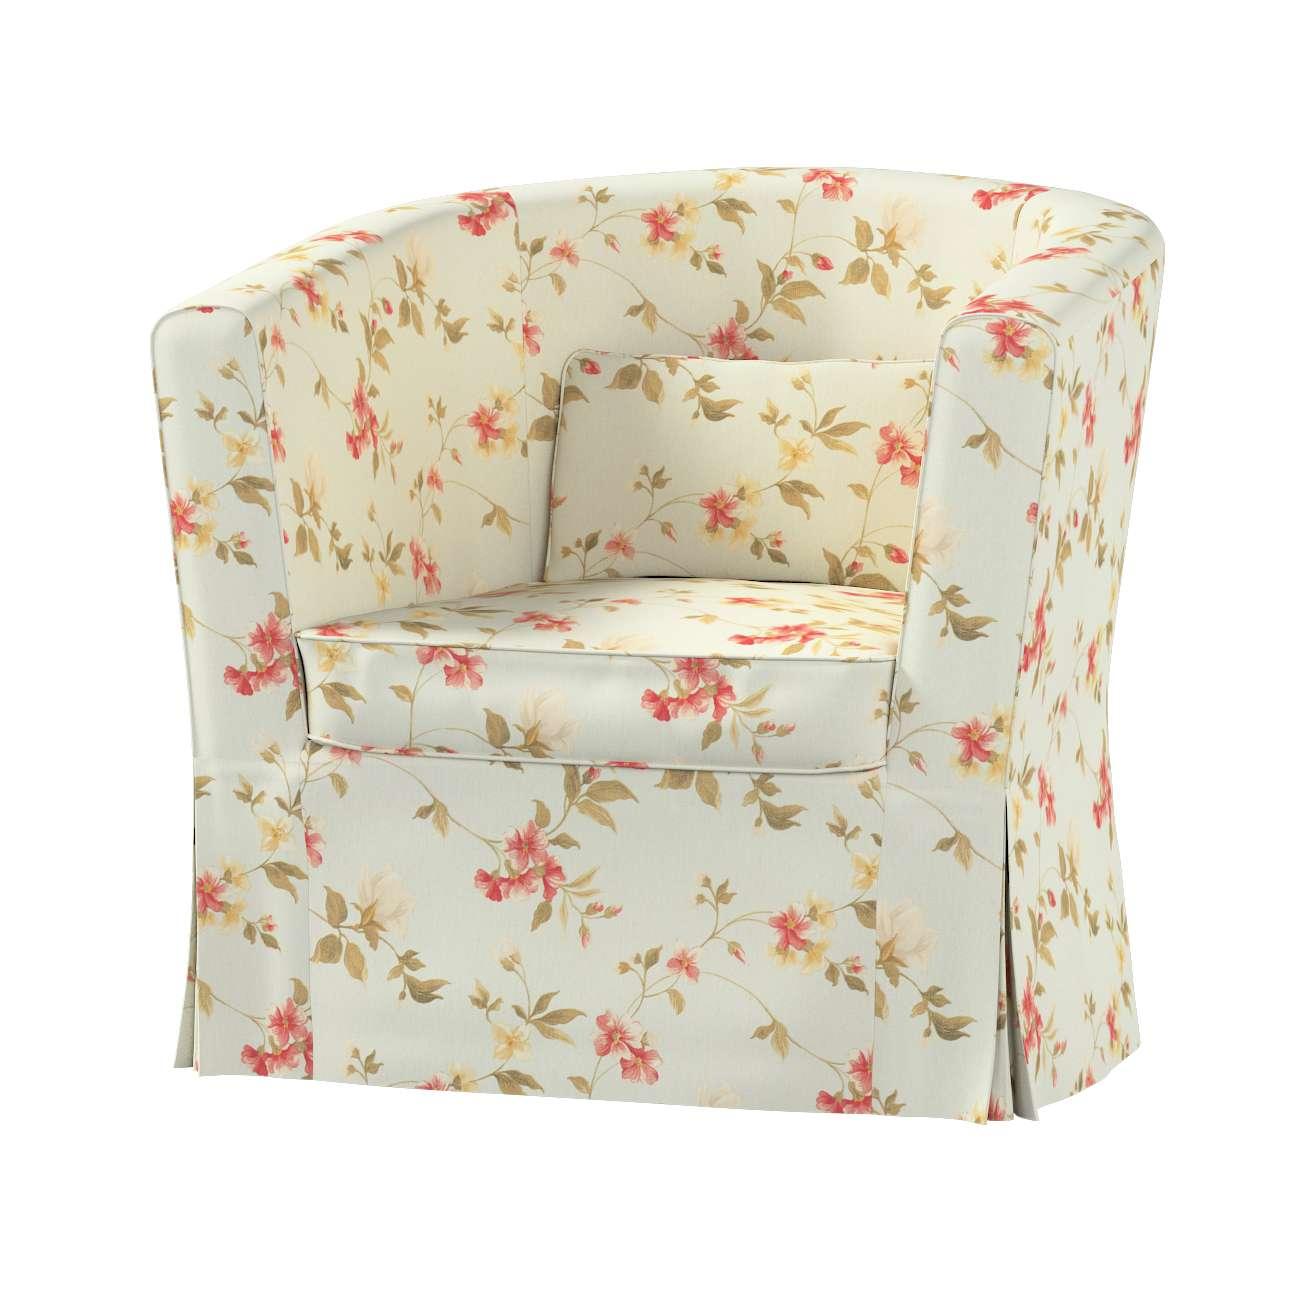 Pokrowiec na fotel Ektorp Tullsta fotel Ektorp Tullsta w kolekcji Londres, tkanina: 124-65